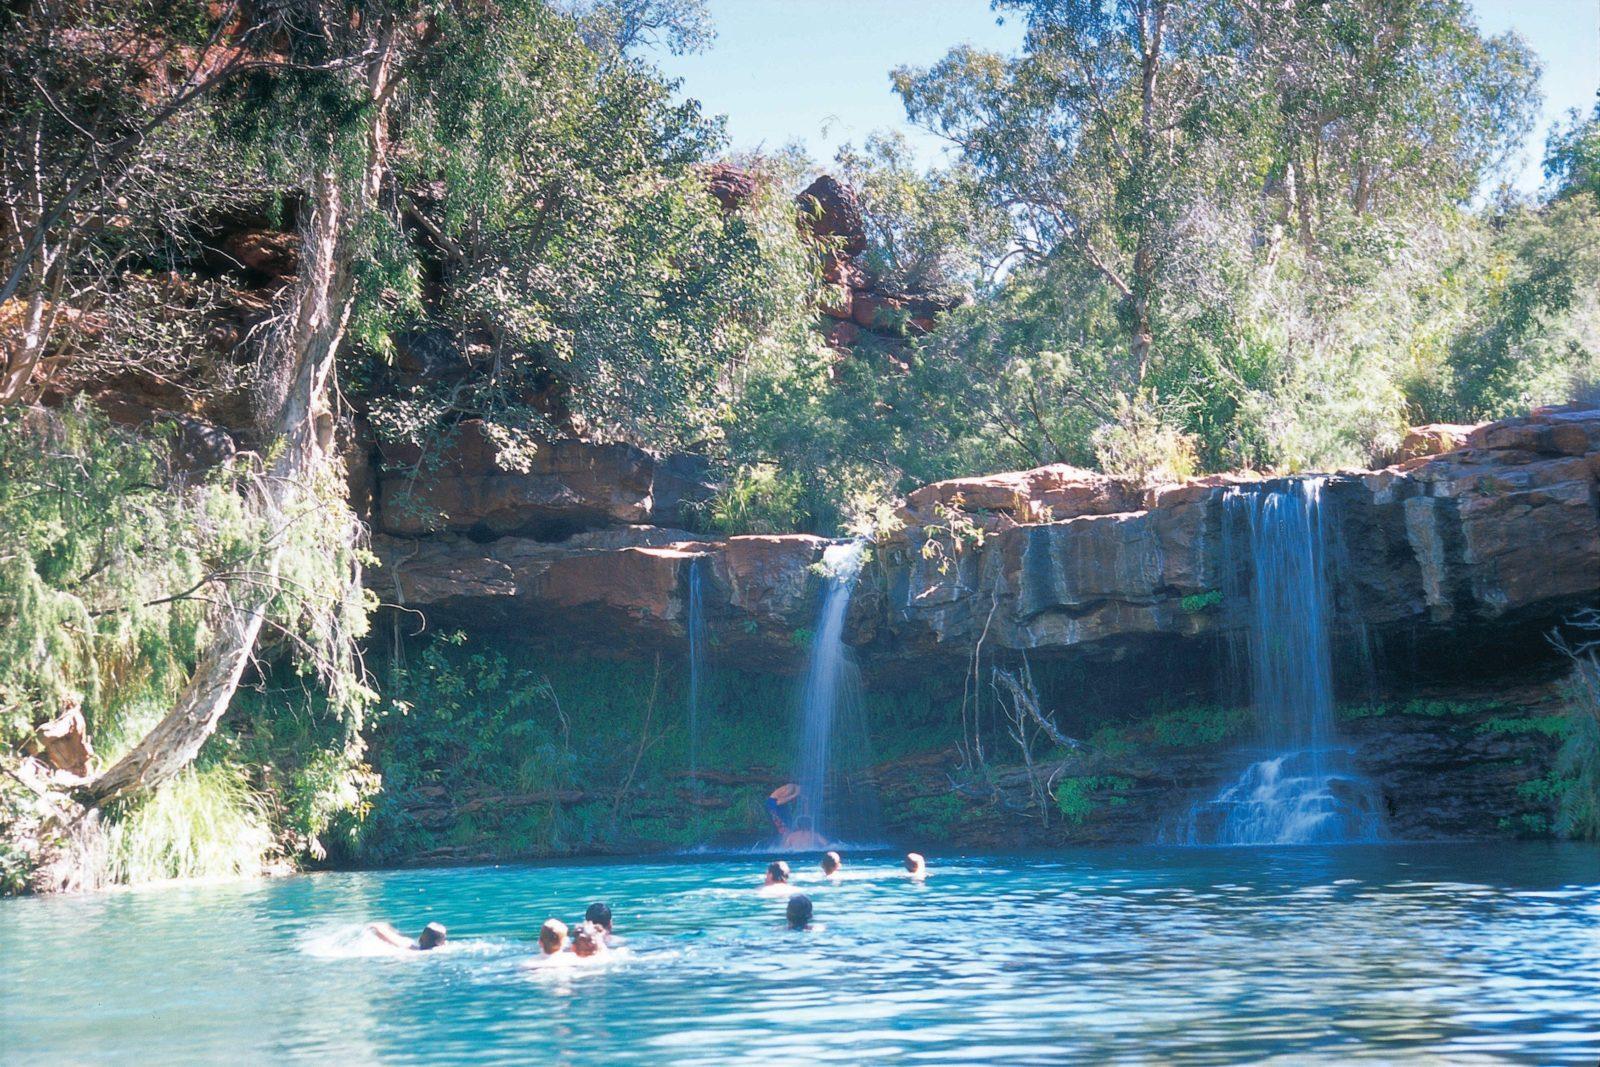 Dales Gorge Camp, Karijini National Park, Western Australia